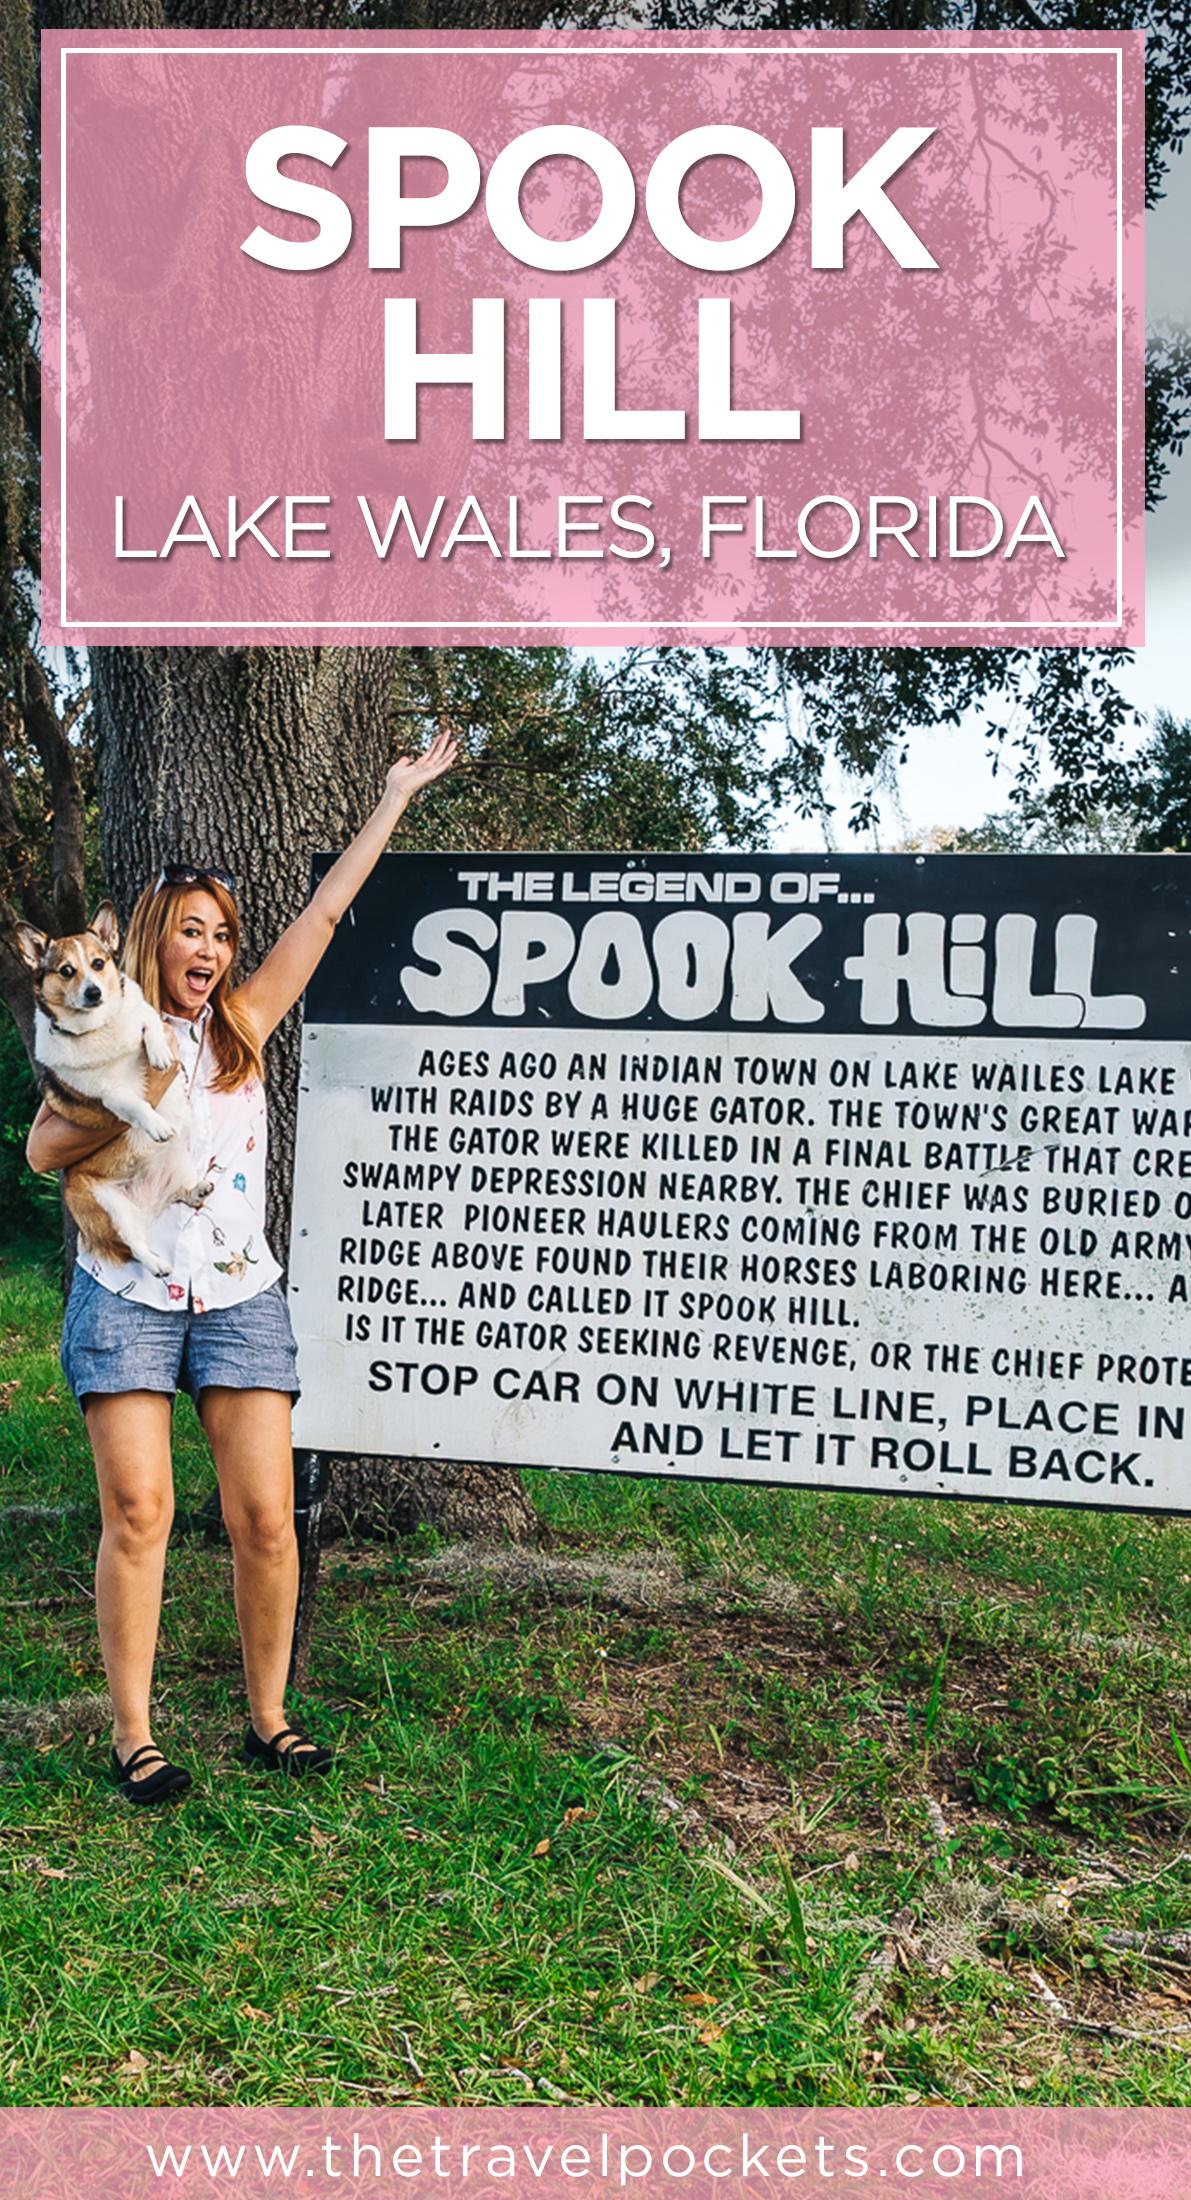 Spook Hill www.thetravelpockets.com